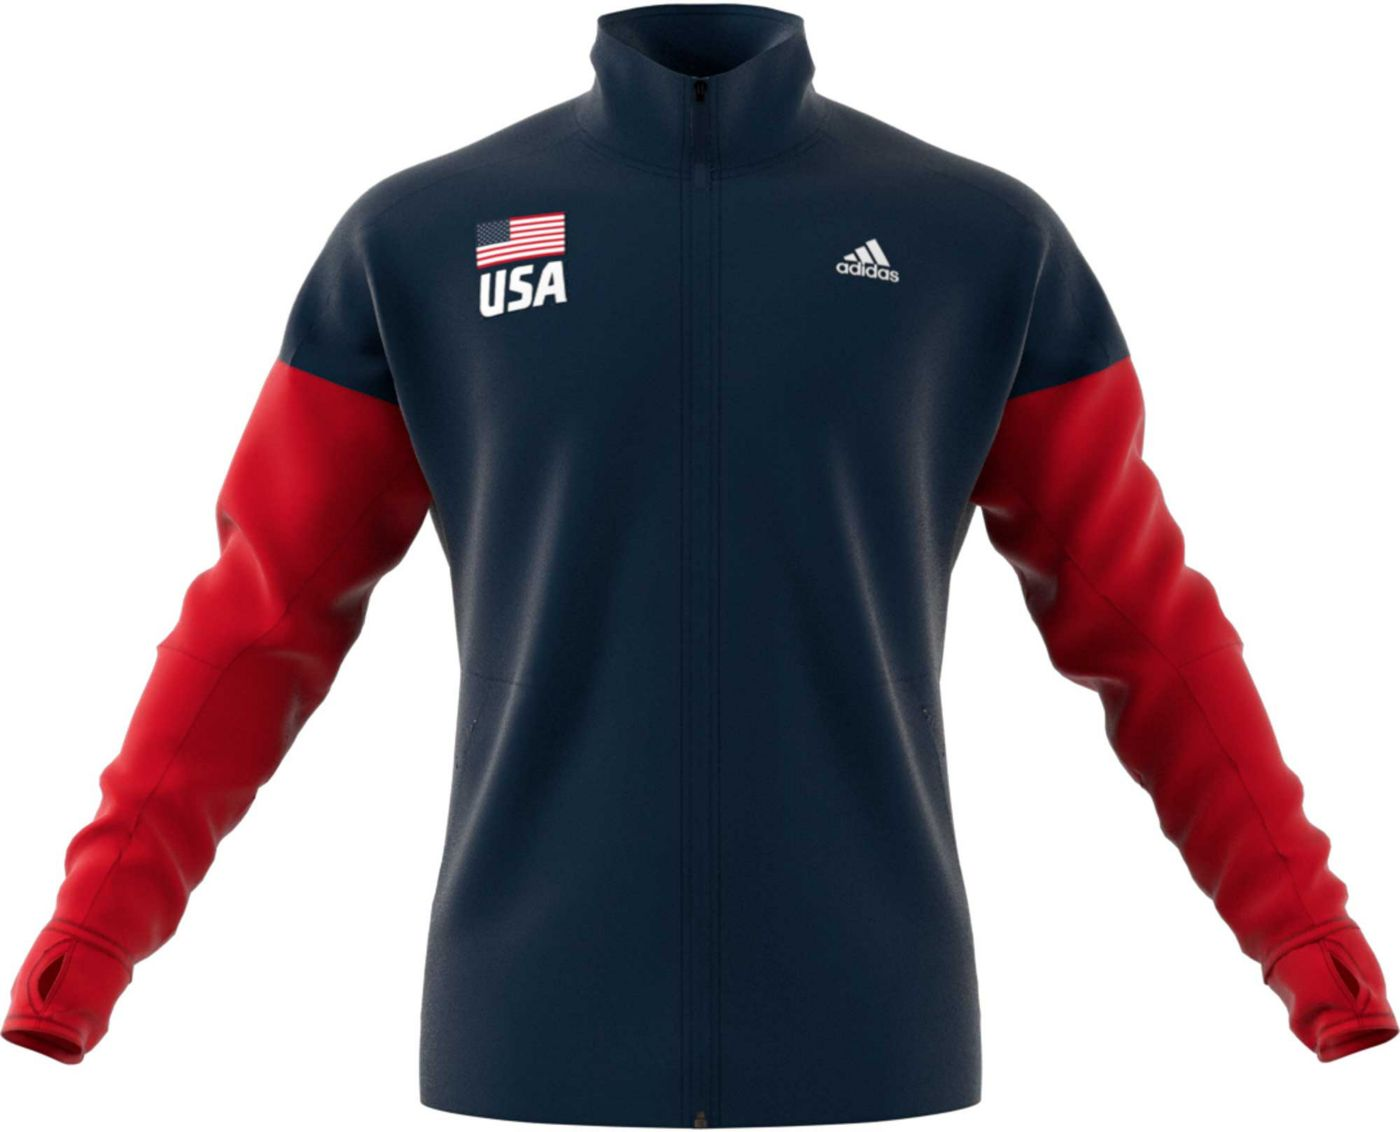 adidas Men's USA Volleyball Full-Zip Warmup Jacket